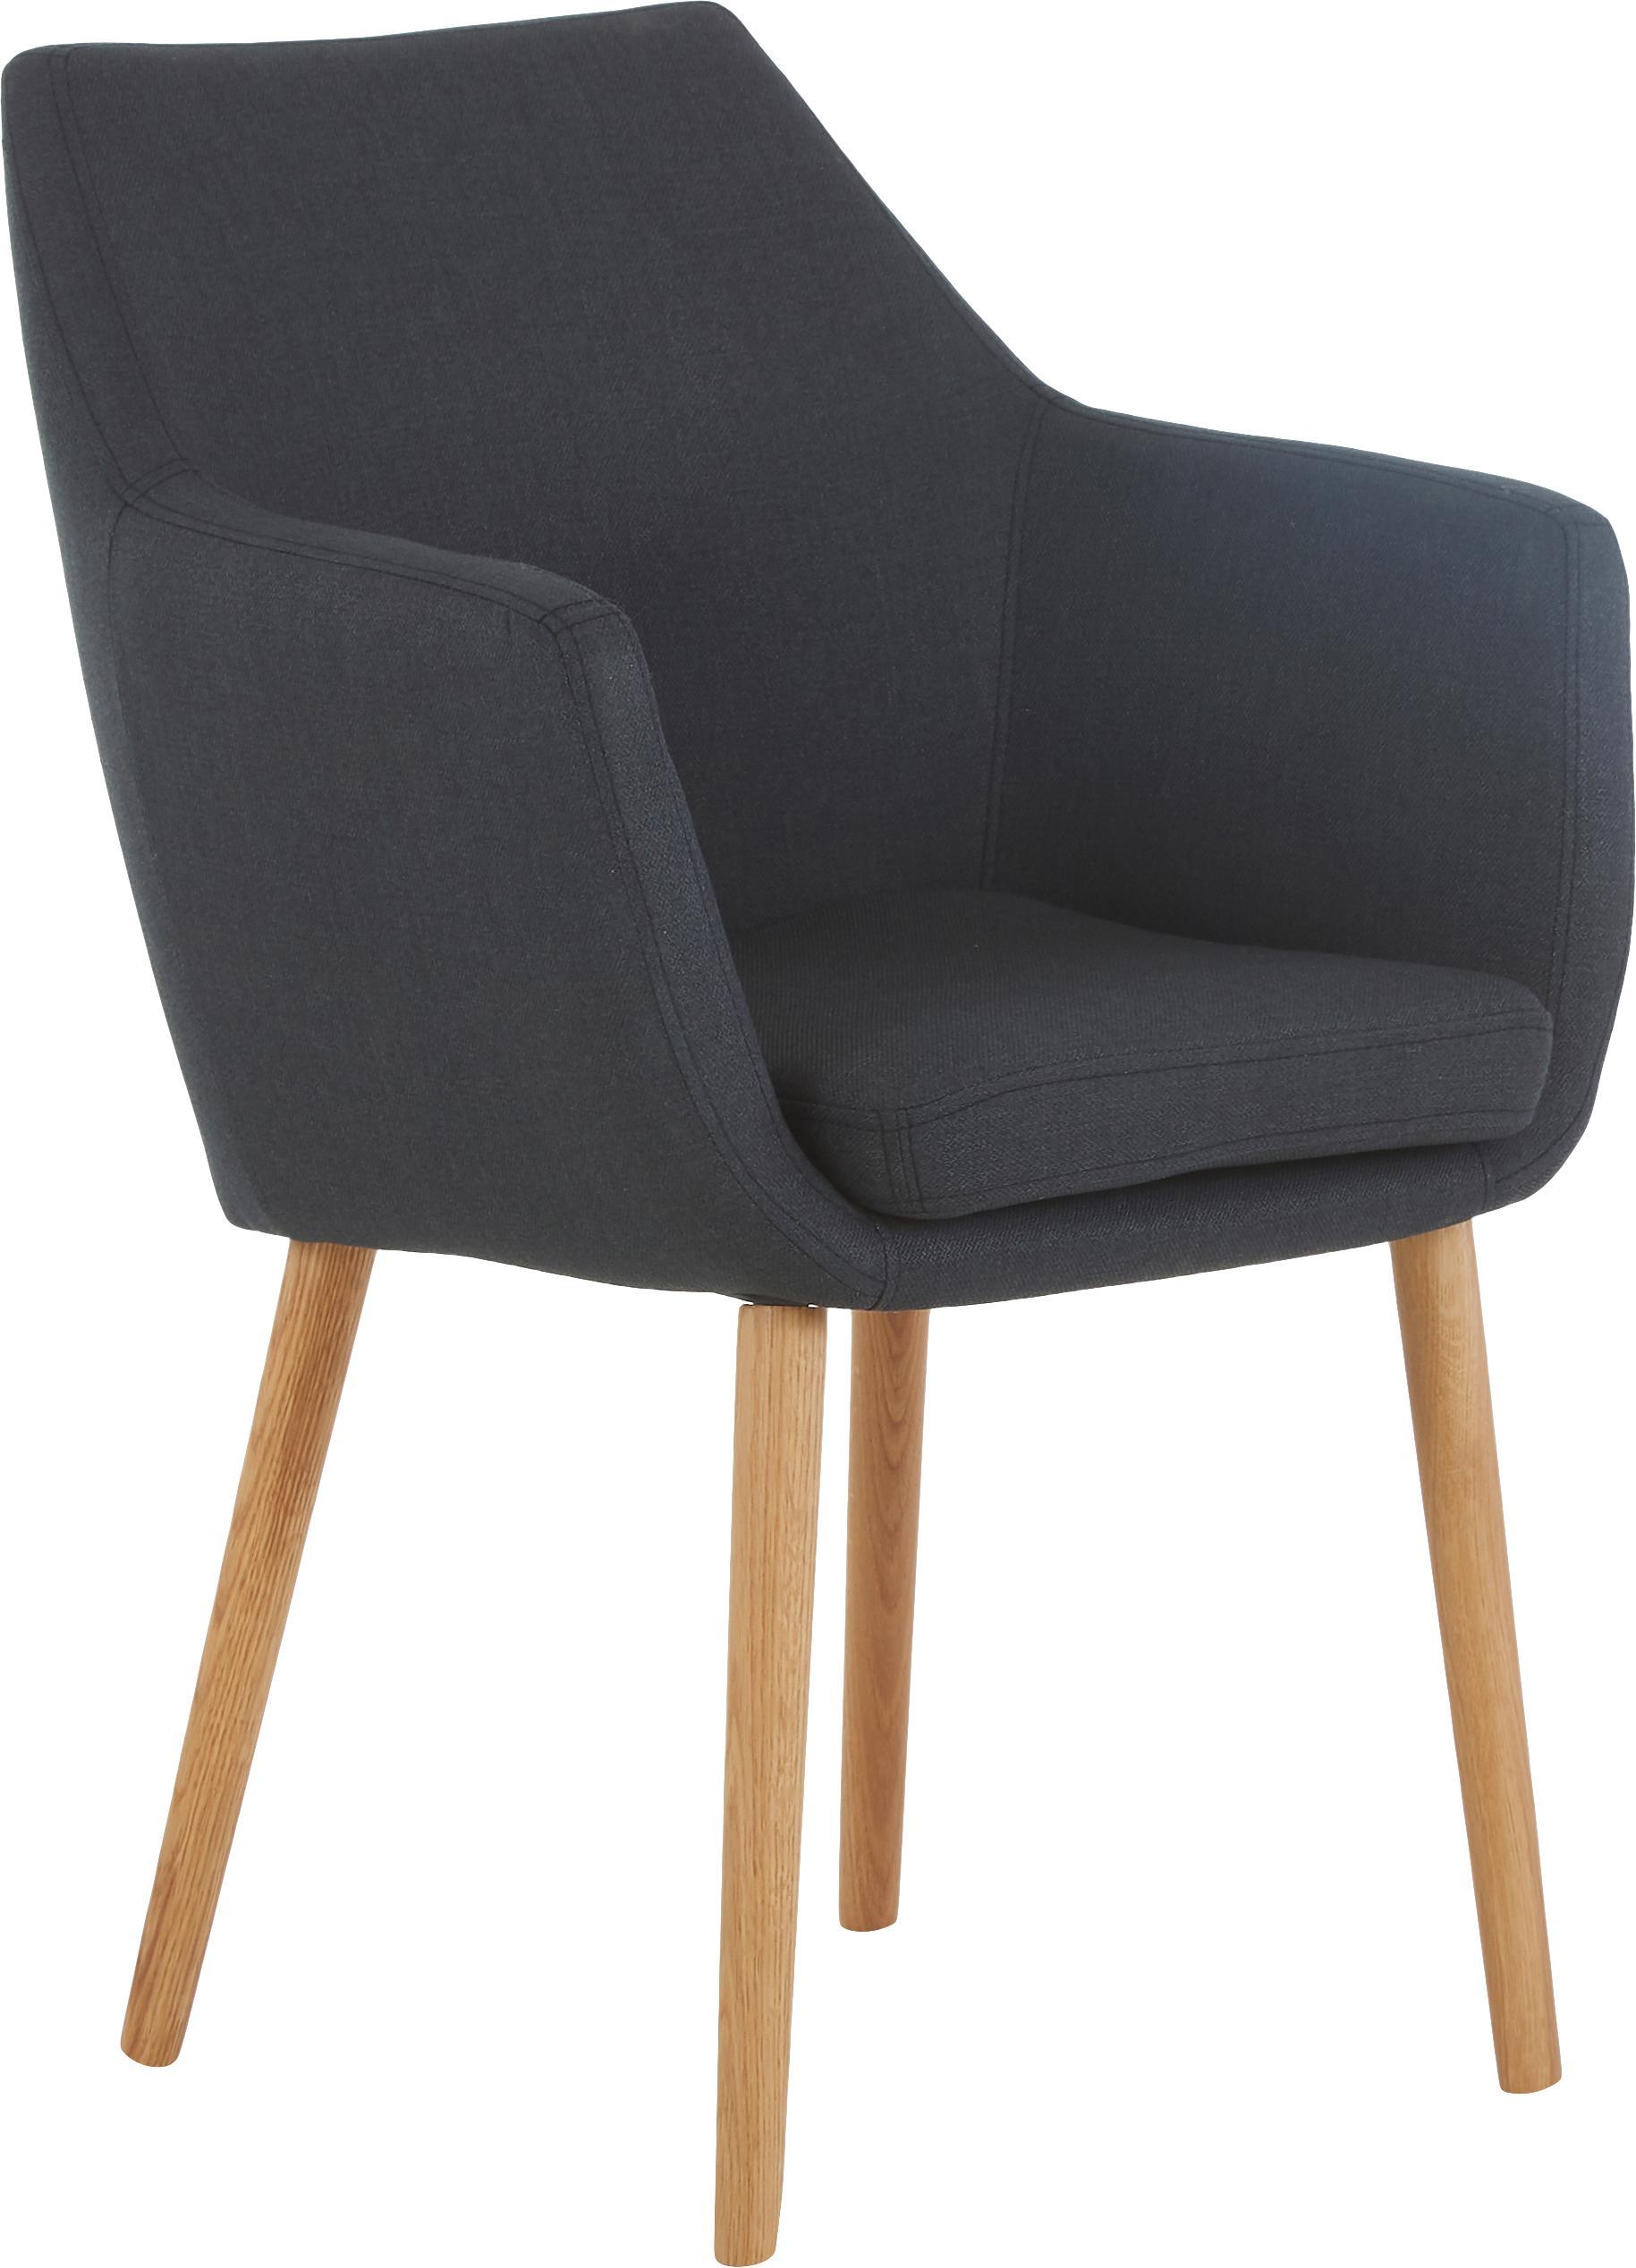 Armstoel Nora in Scandi design, Bekleding: 100% polyester, Poten: eikenhout, Bekleding: antraciet. Frame: eikenhoutkleurig, 58 x 84 cm